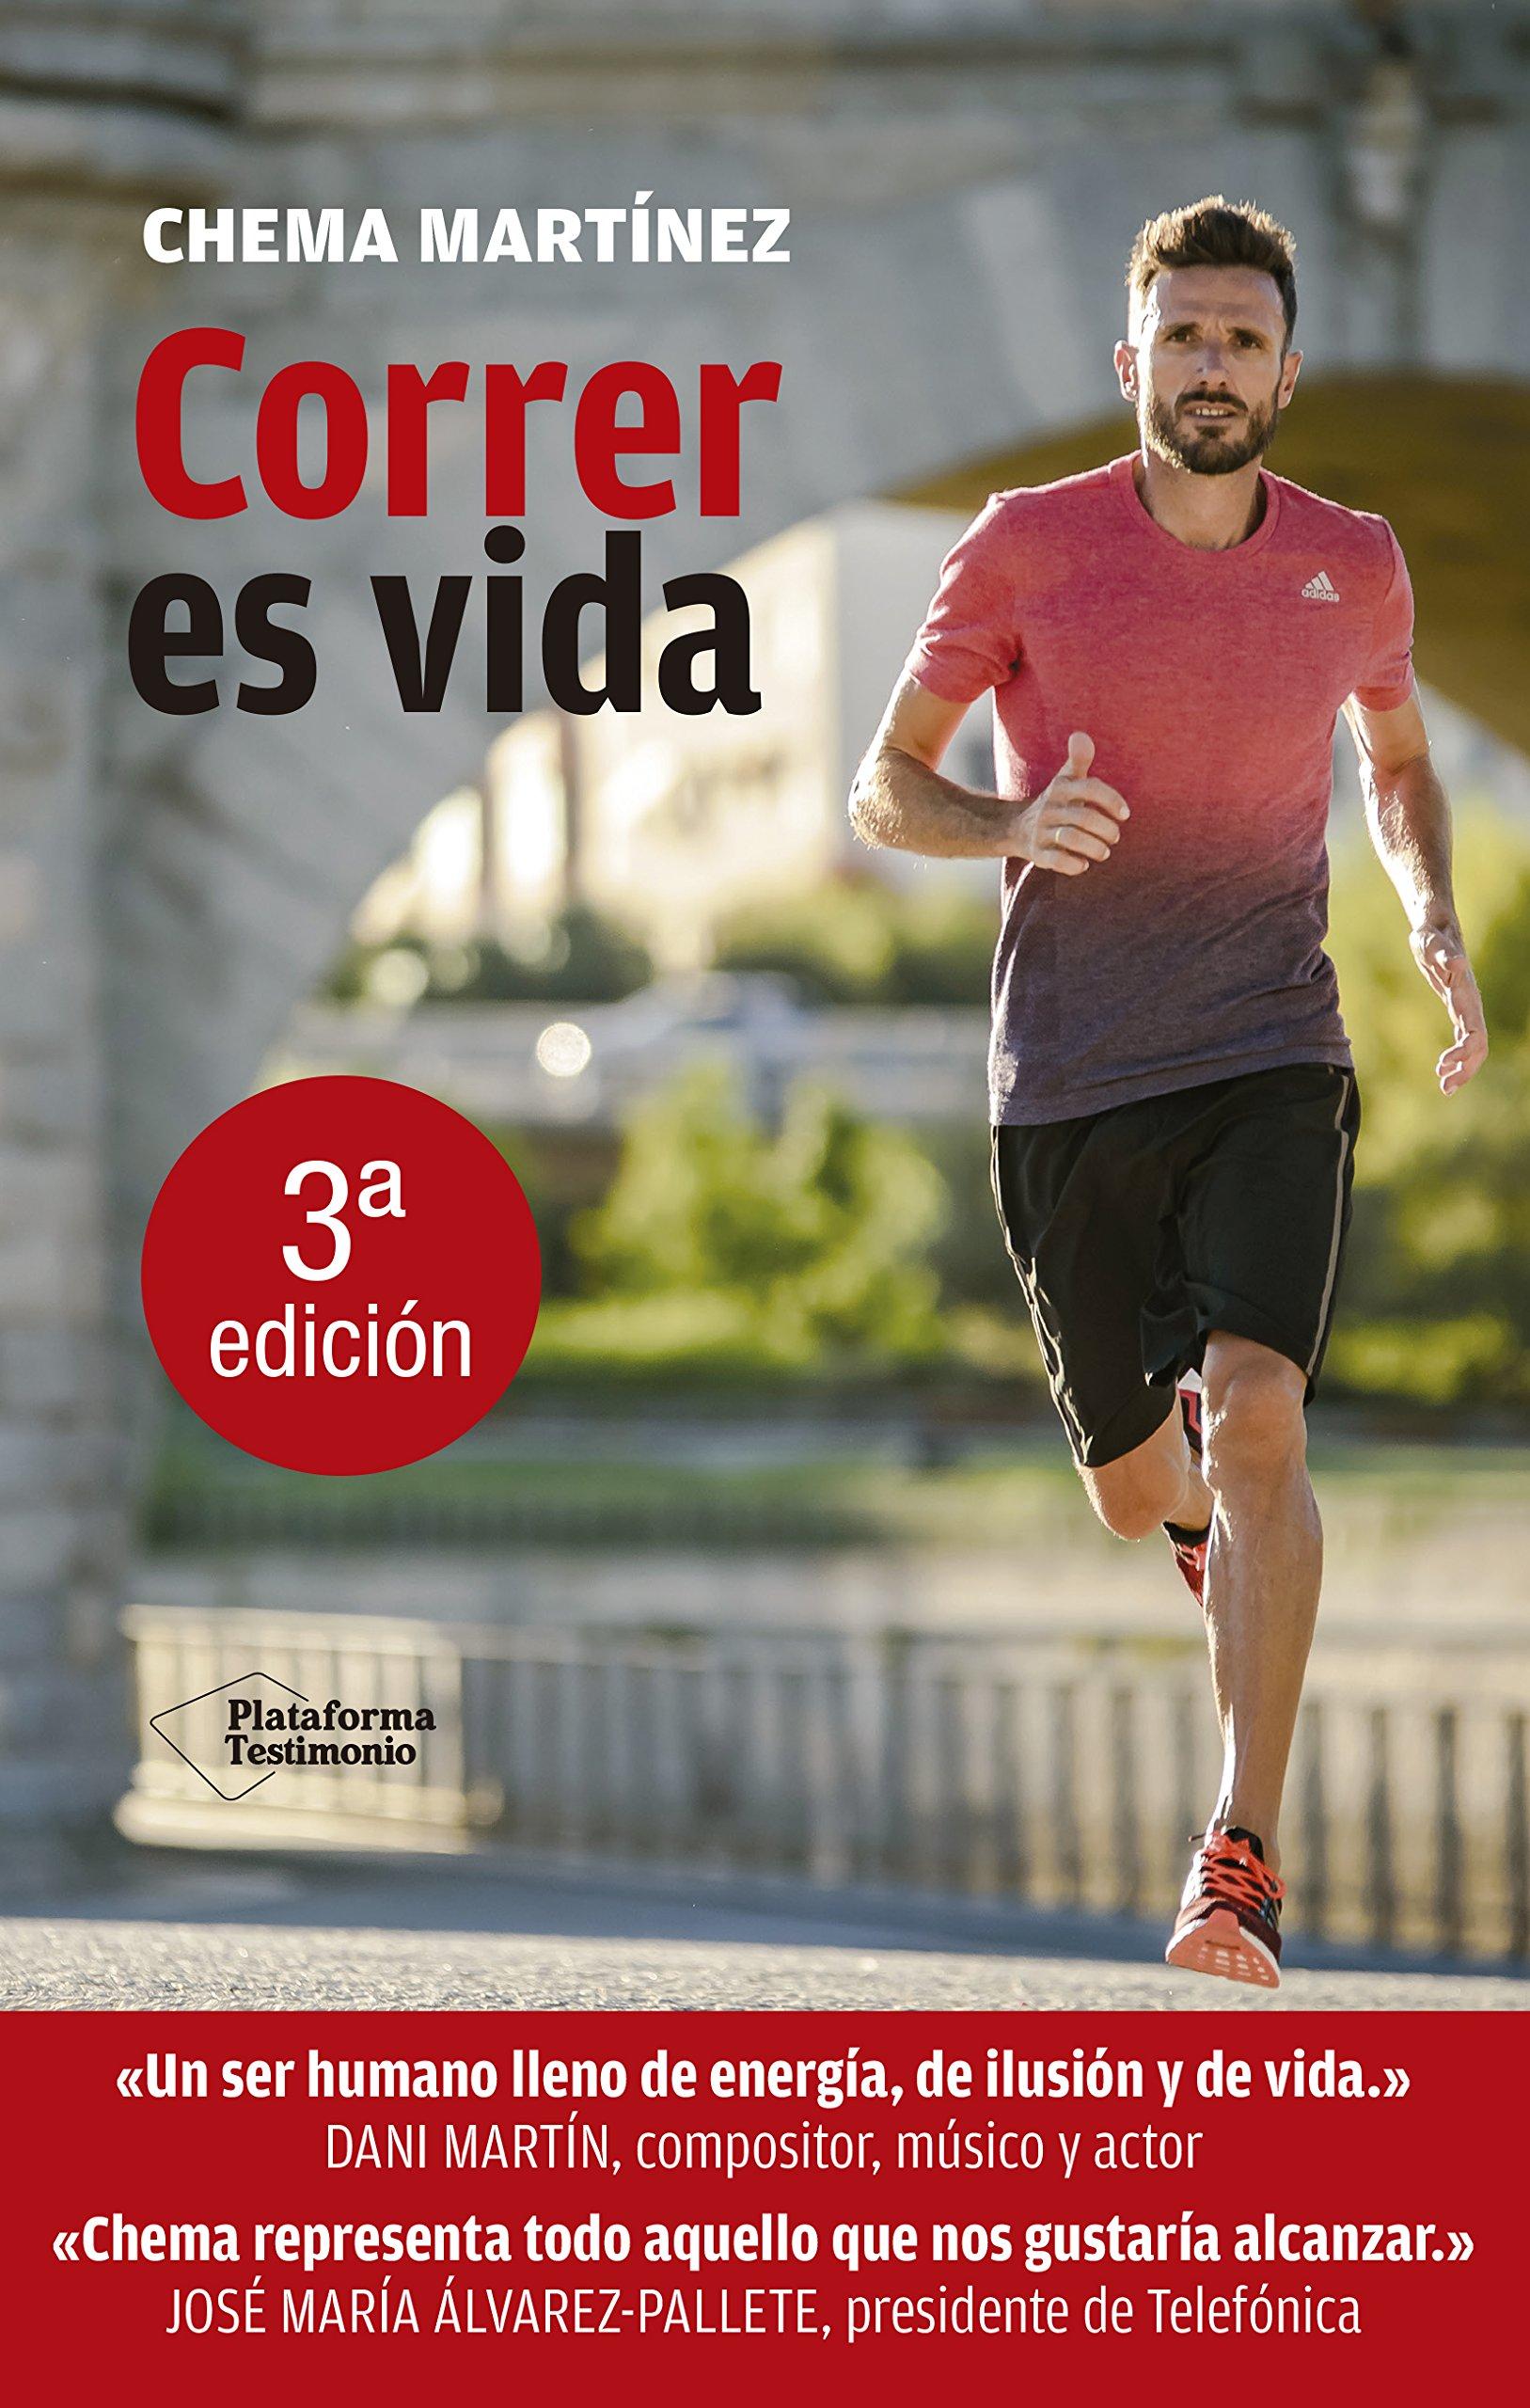 Correr es vida (Plataforma testimonio) (Spanish Edition) (Spanish) Paperback – August 1, 2012